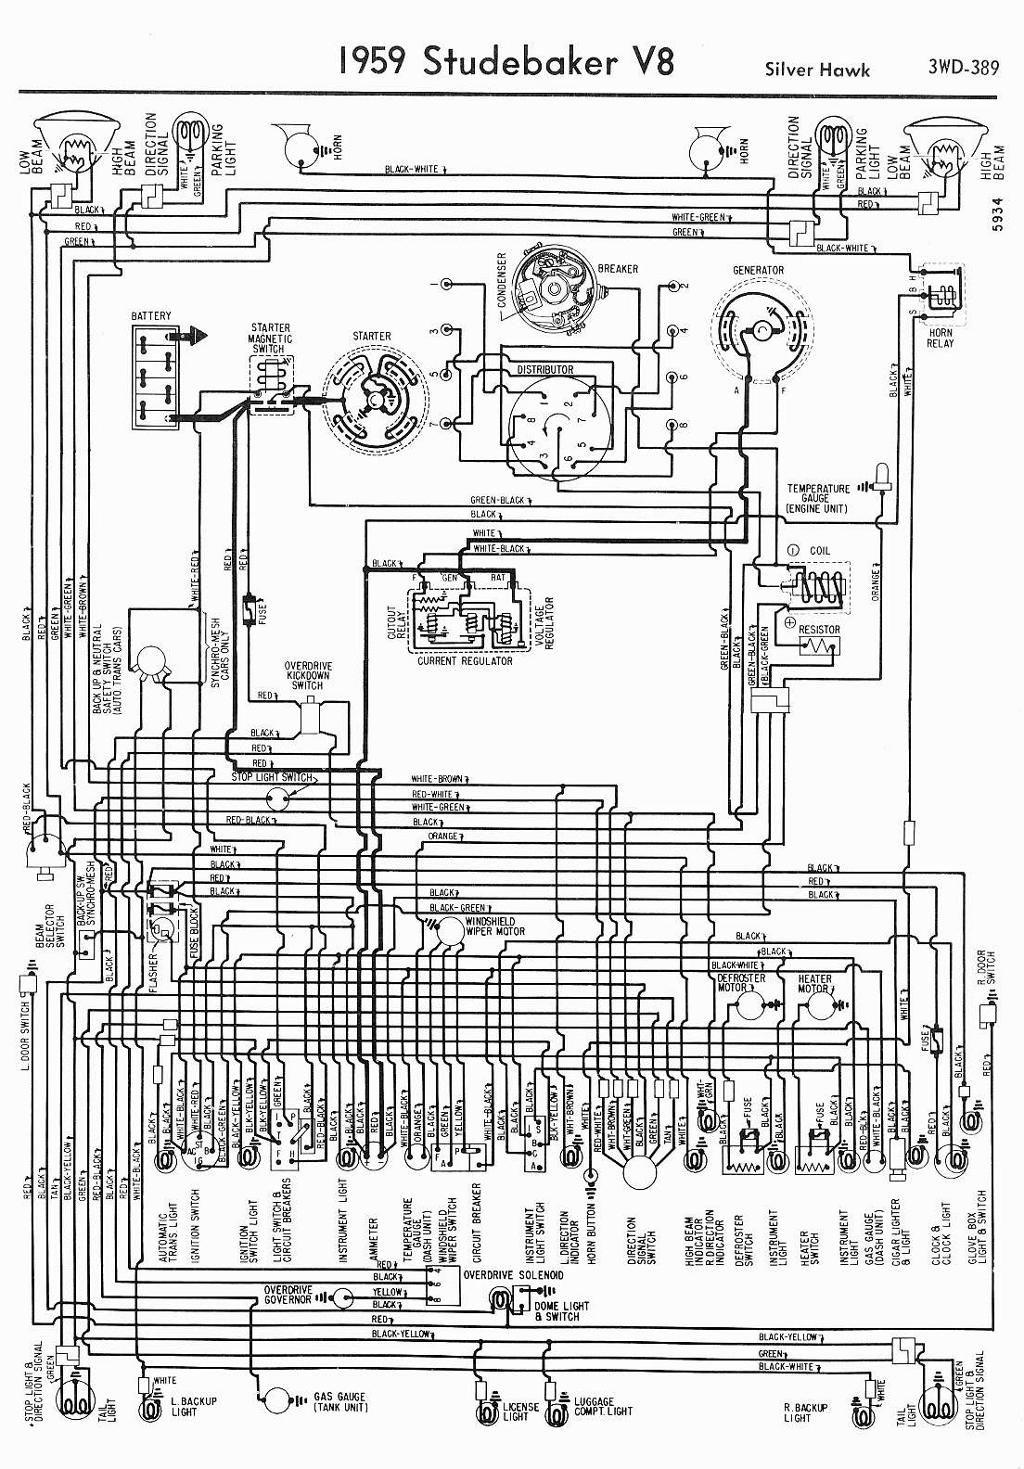 studebaker engine diagrams wiring diagram data val related image studebaker blueprints drawings diagram 1954 [ 1024 x 1469 Pixel ]